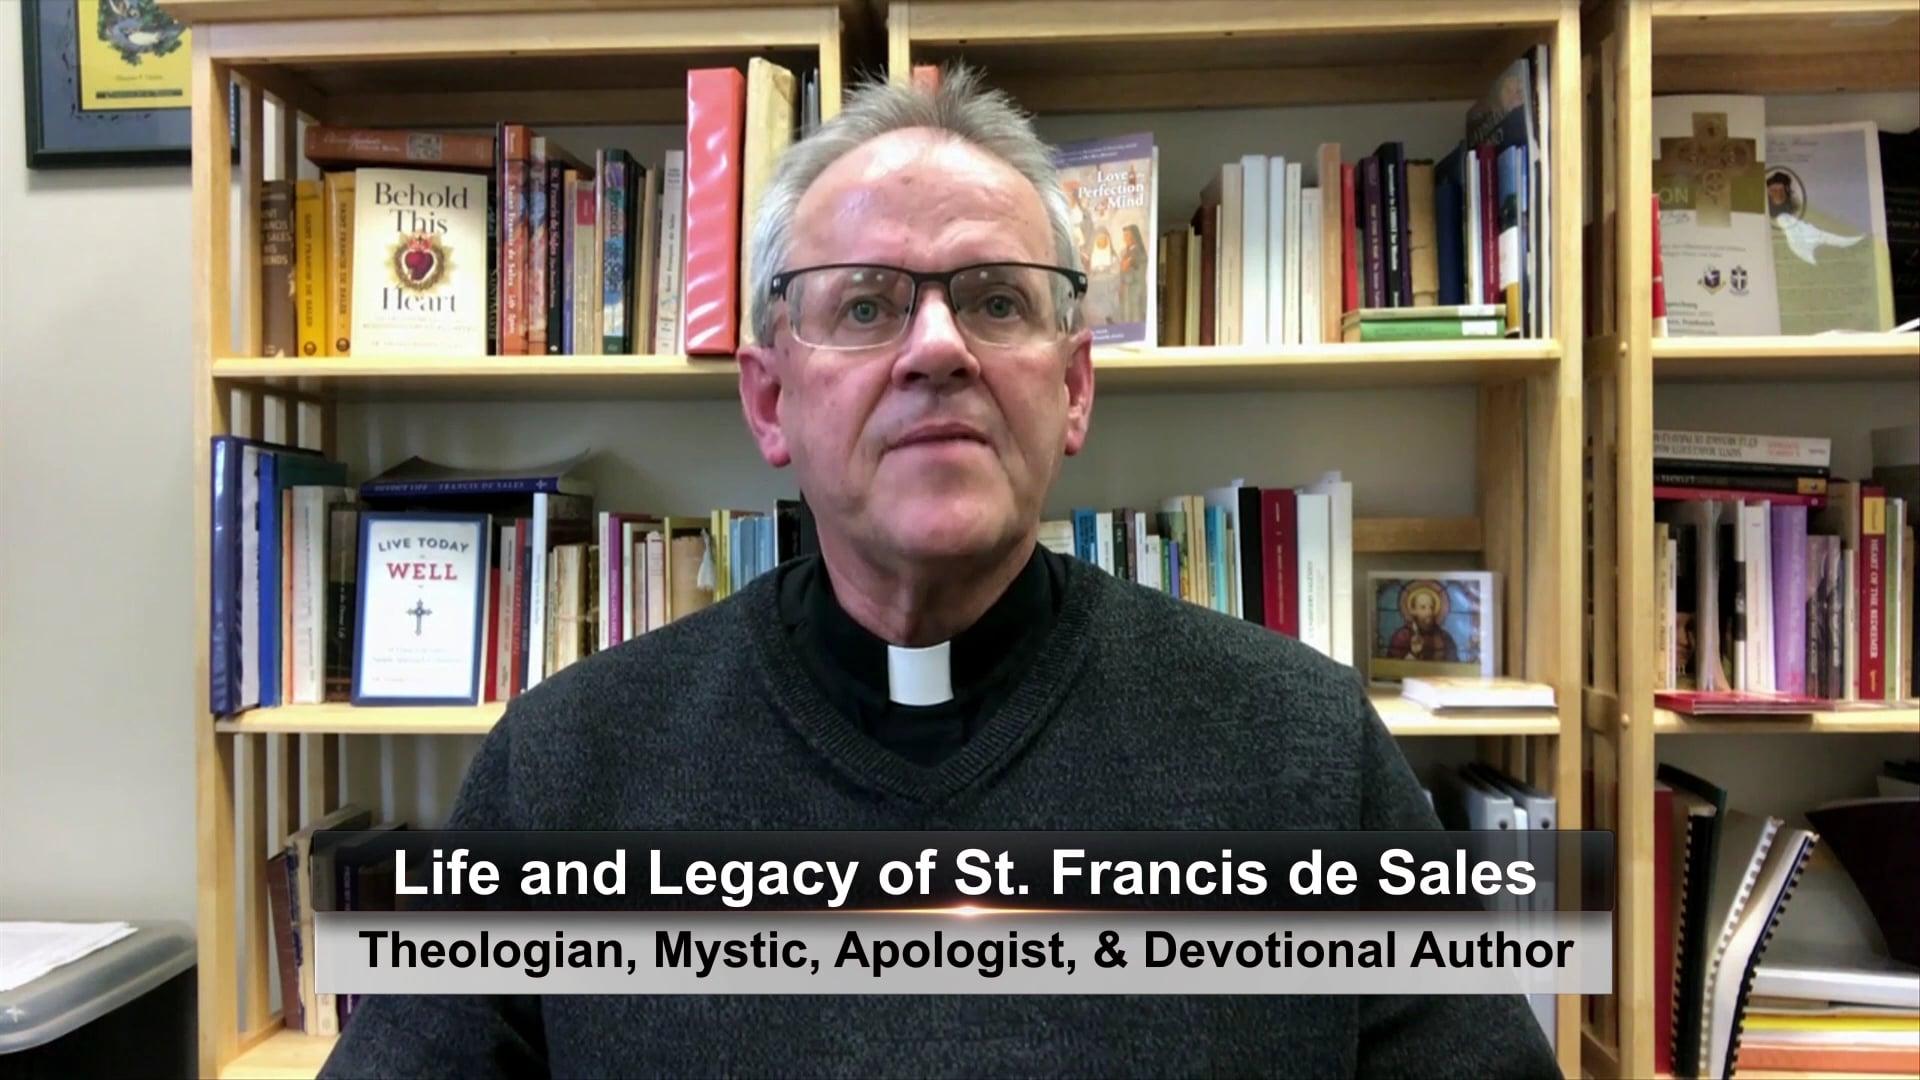 Encounter - The Spiritual Legacy of St. Francis de Sales, Part 2